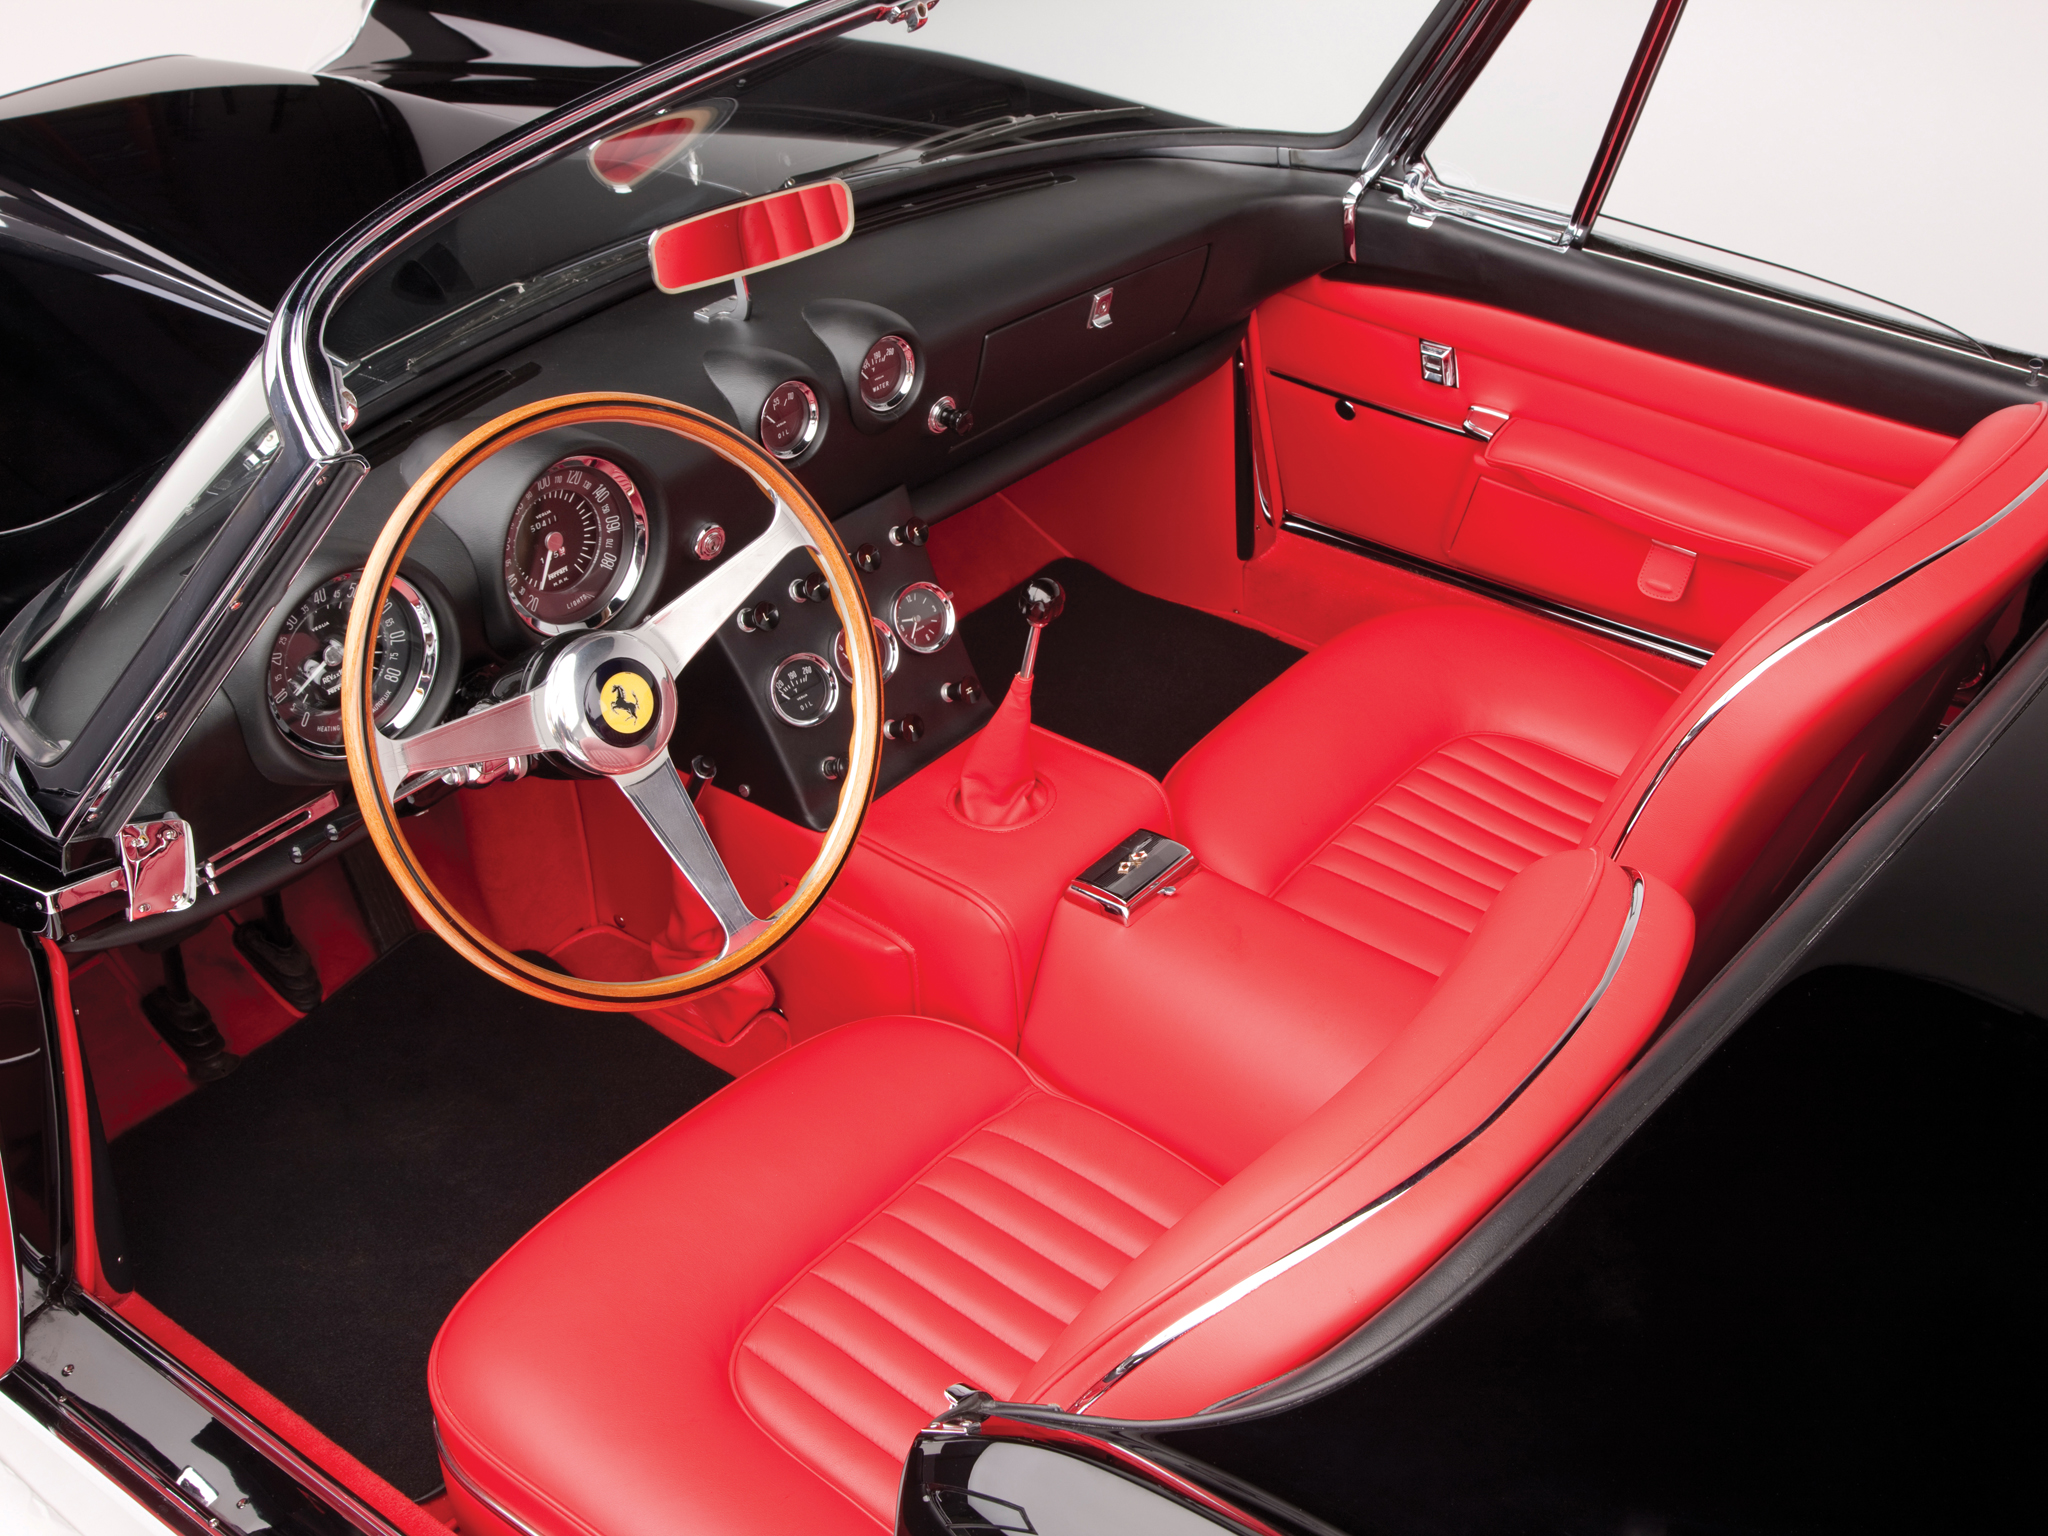 1962 ferrari 400 superamerica cabriolet tipo 538 classic supercar supercars interior wallpaper. Black Bedroom Furniture Sets. Home Design Ideas